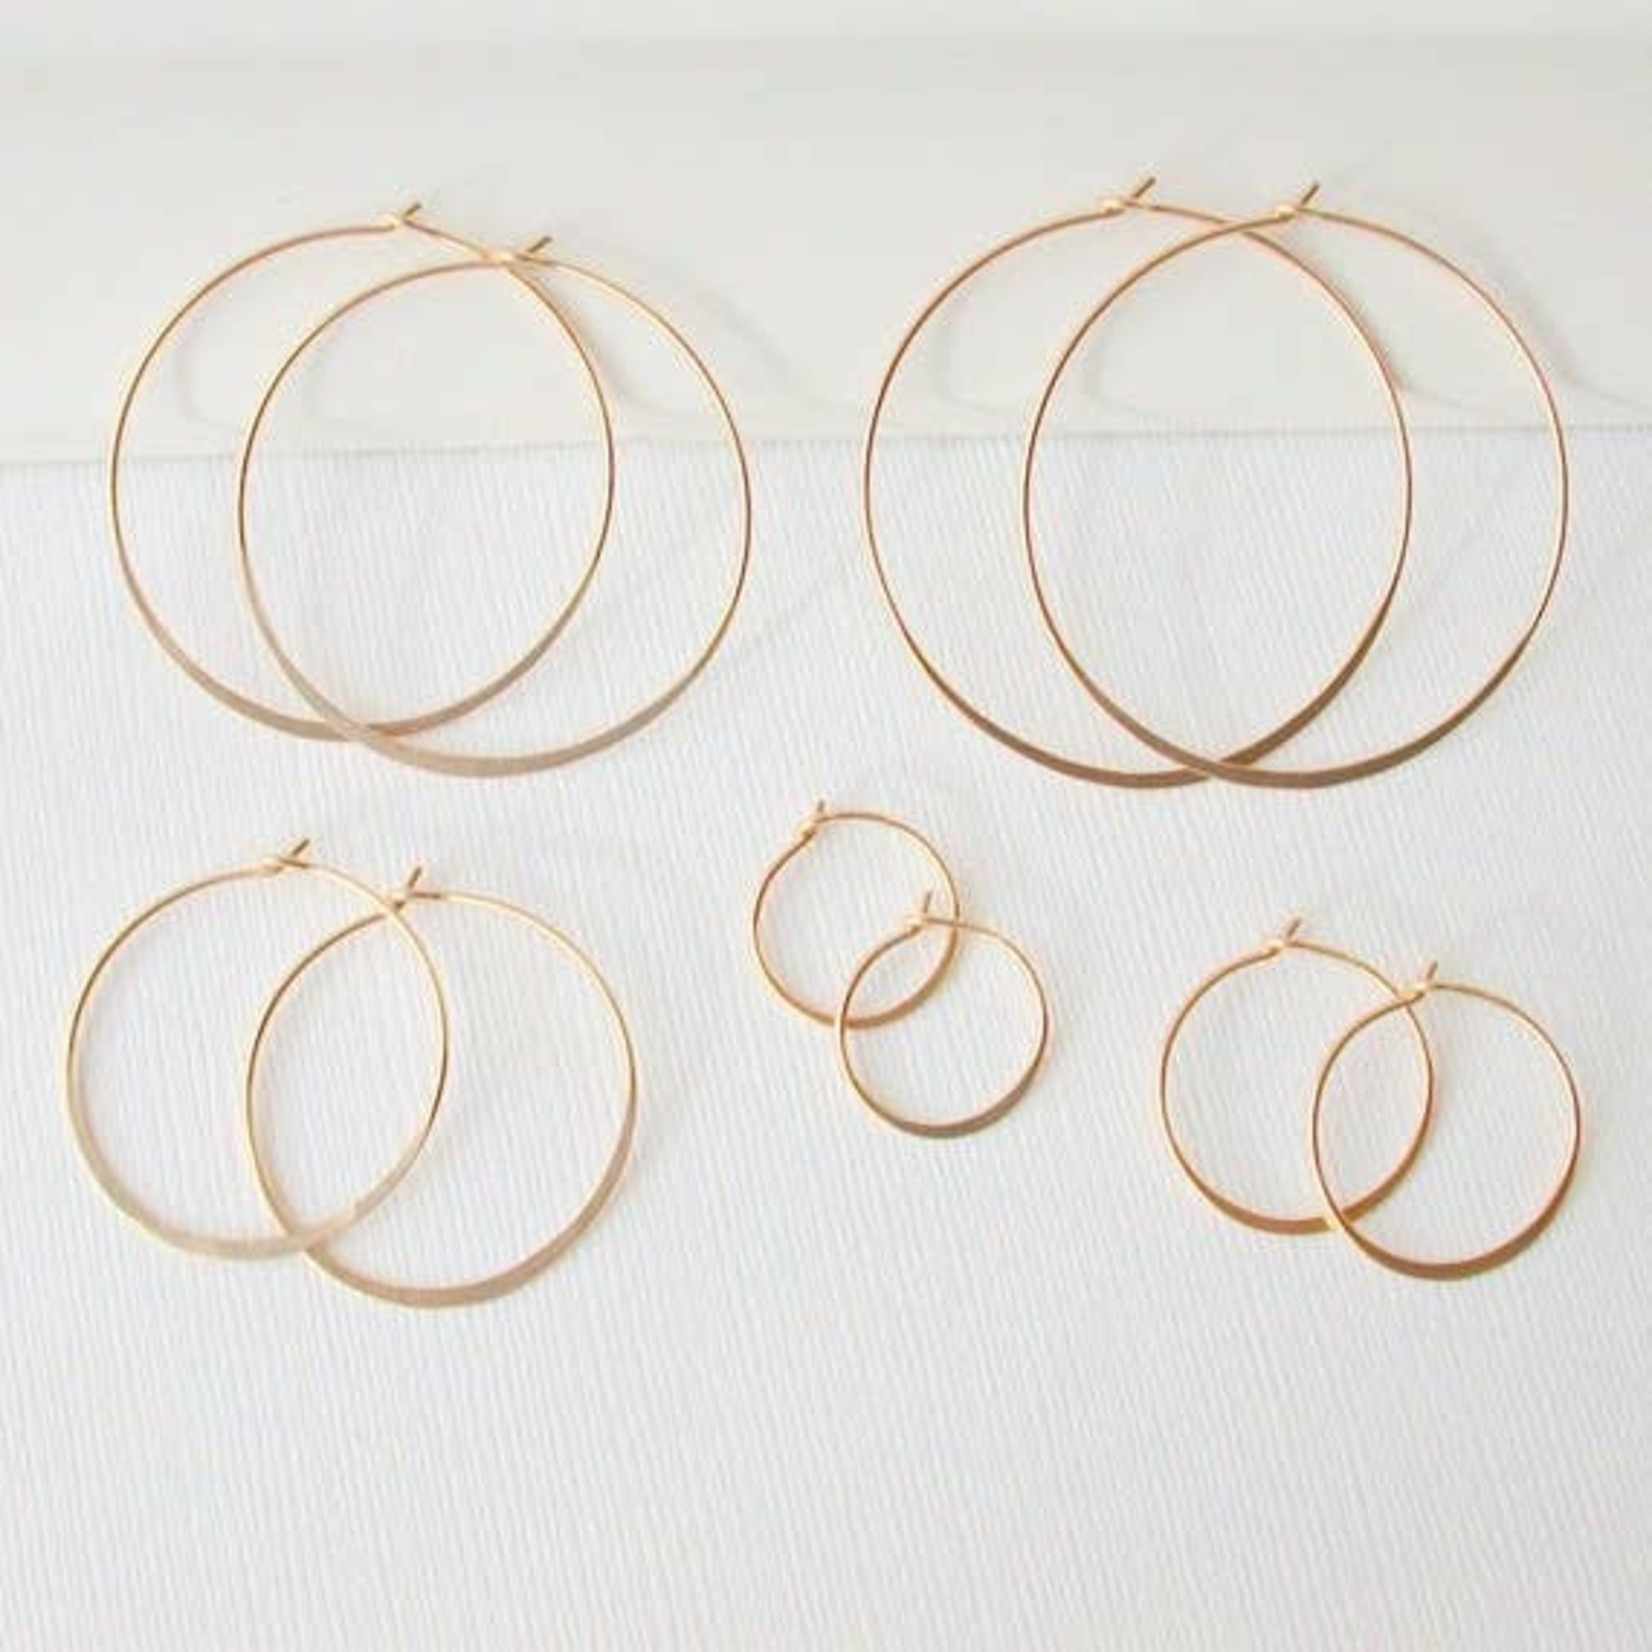 Linda Trent Jewelry Linda Trent 14K GOLD Fill Hoop Earring